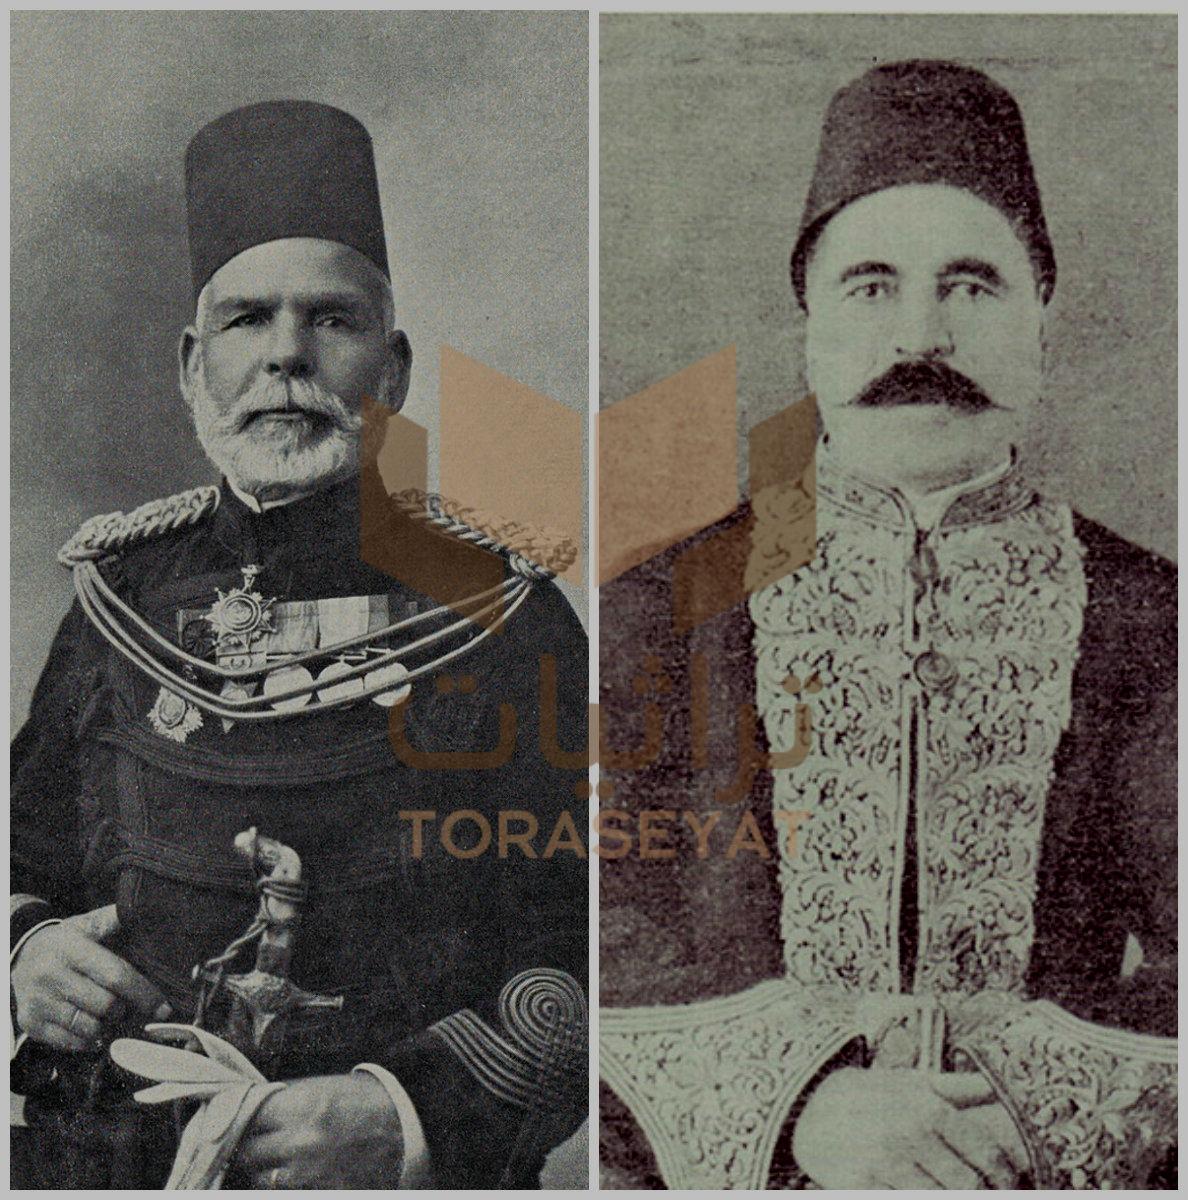 محمد صادق بيه و إبراهيم باشا رفعت